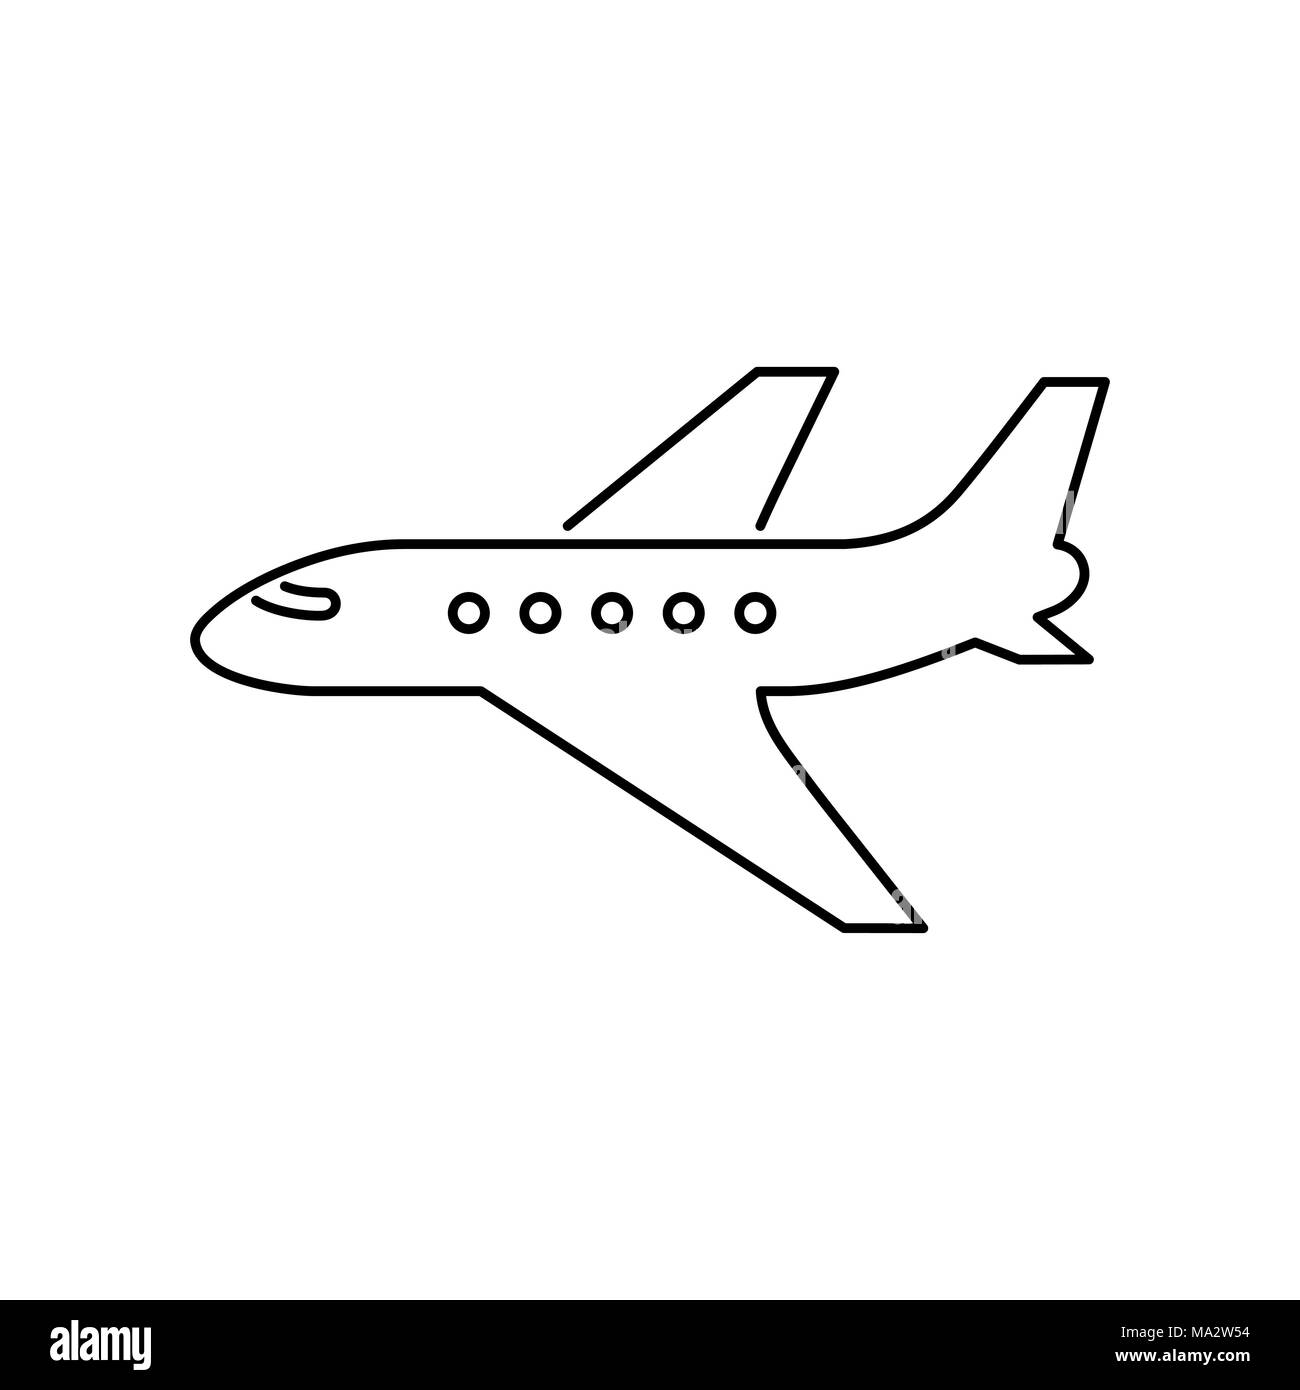 Plane icon simple flat vector illustration. - Stock Image